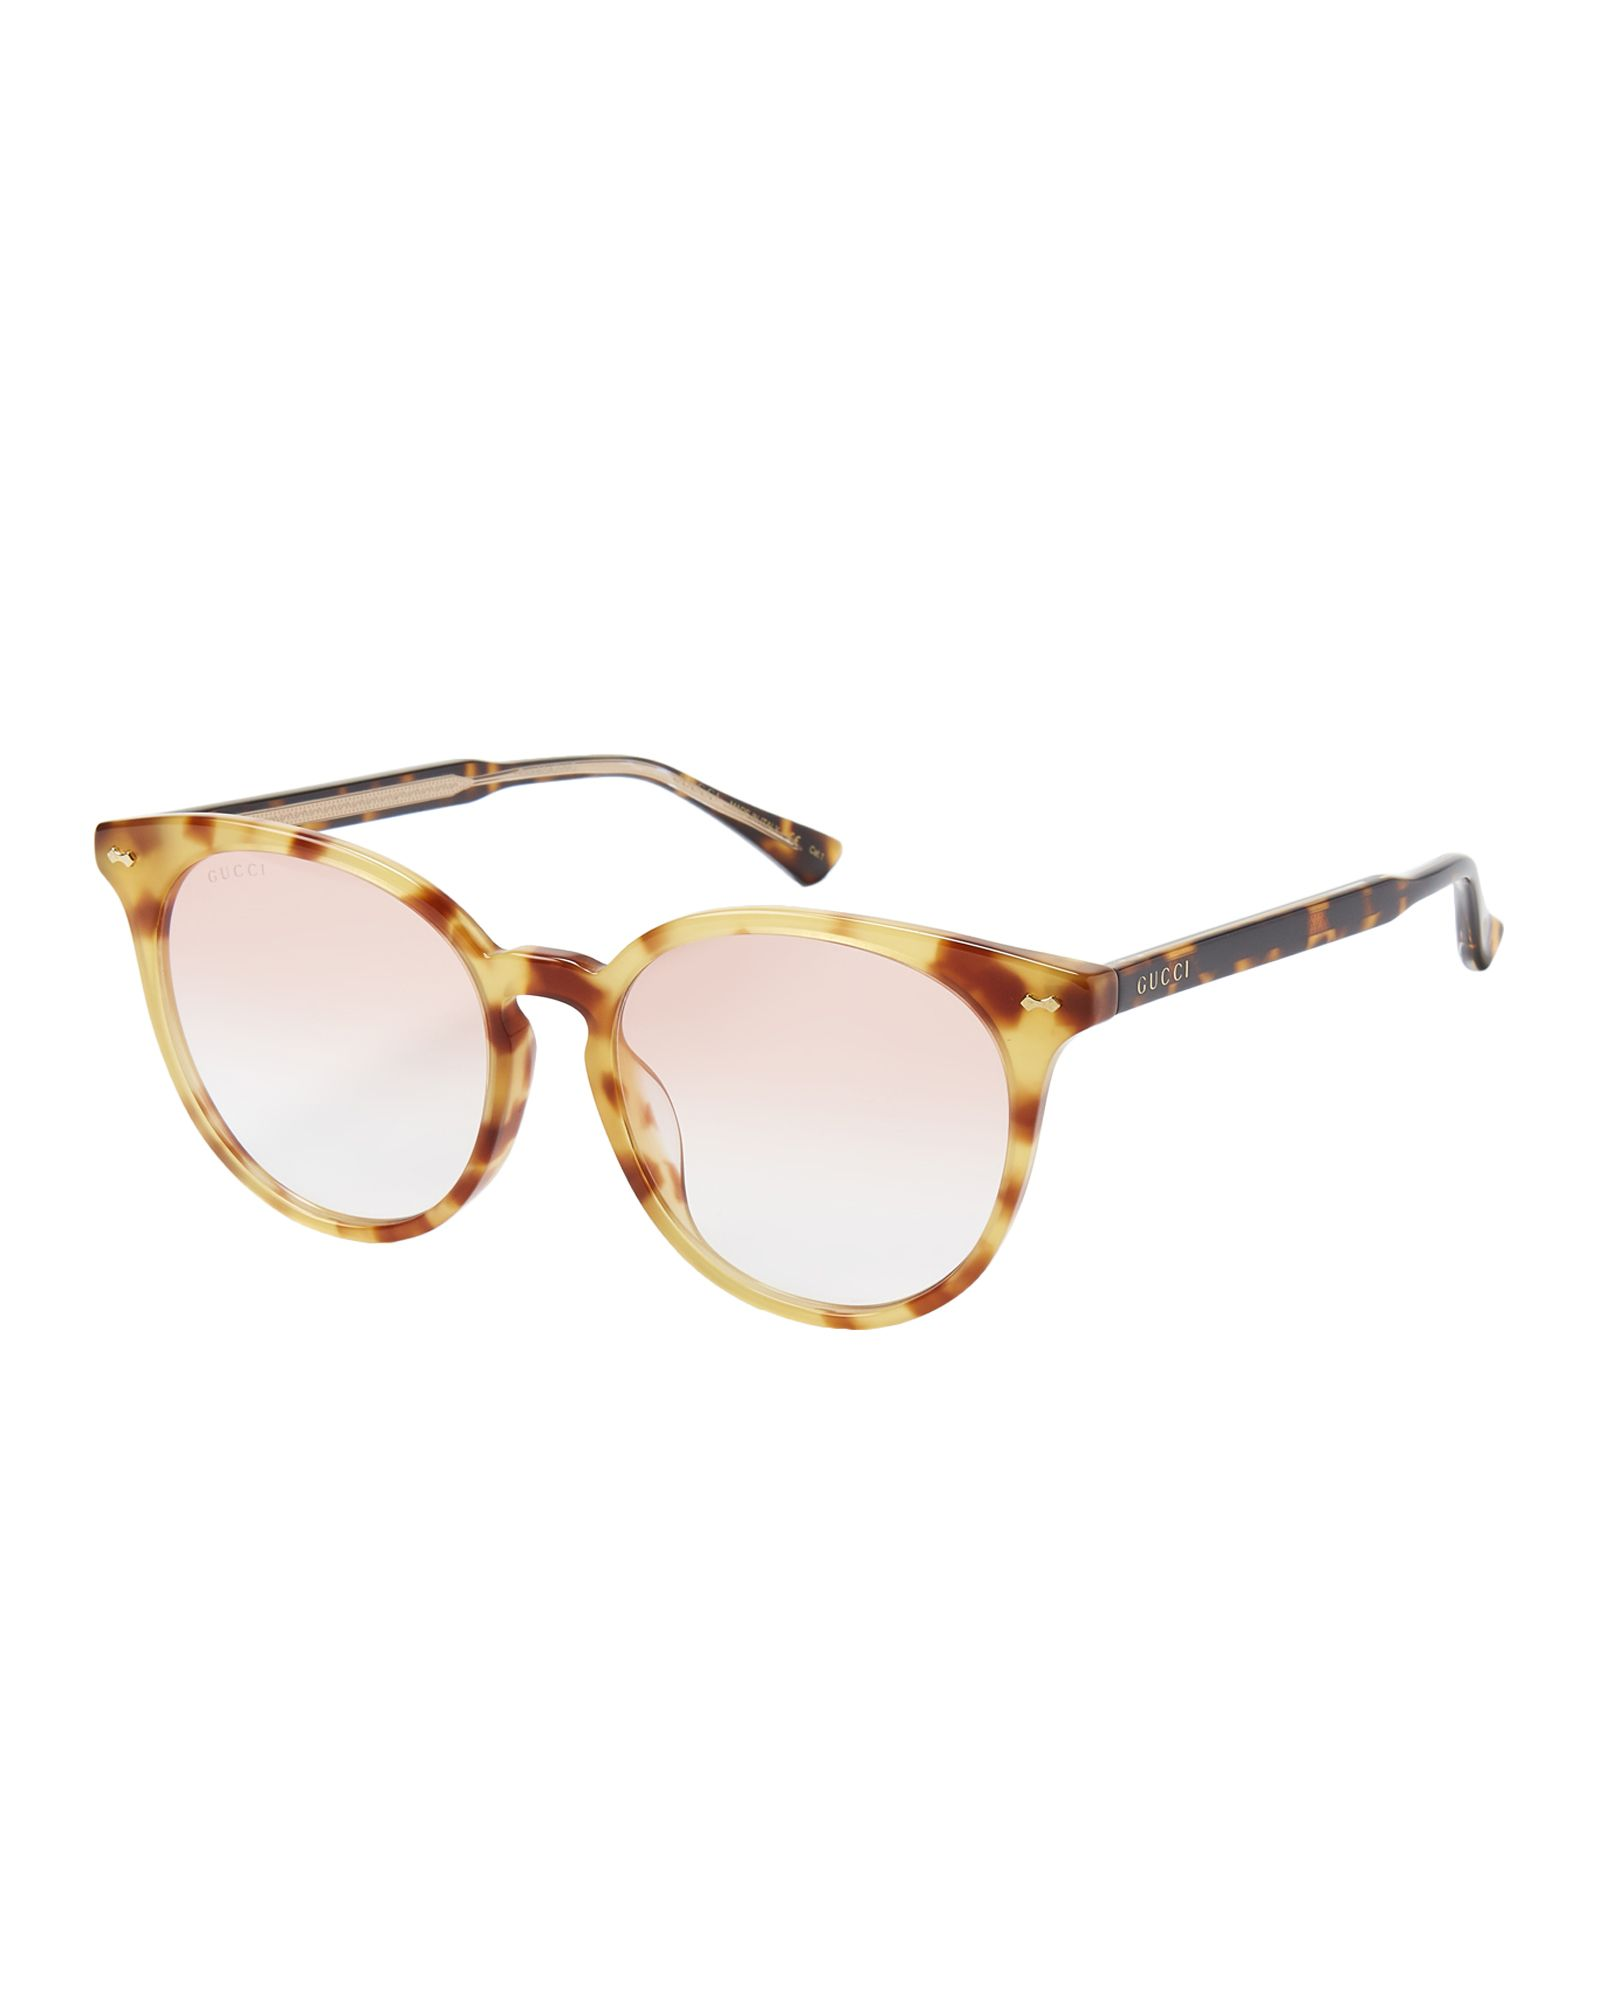 b1b2ee67a0865 Gucci GG0195SK Orange Tortoiseshell Round Sunglasses